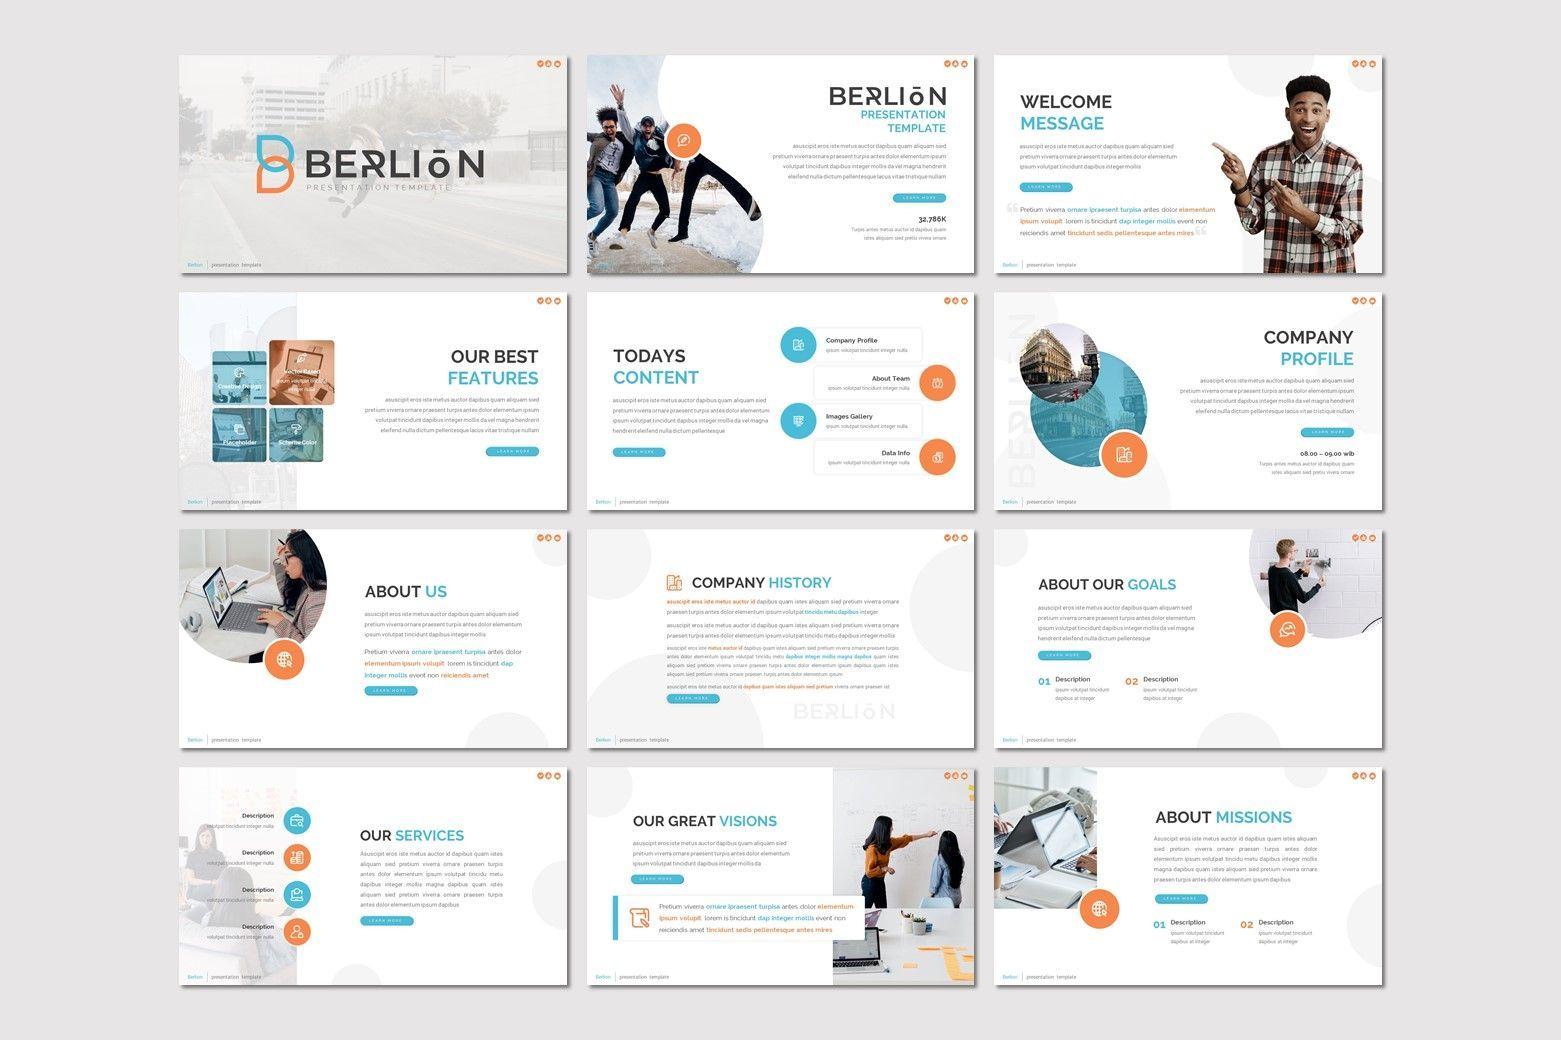 Berlion - Powerpoint Template, Slide 2, 08049, Presentation Templates — PoweredTemplate.com